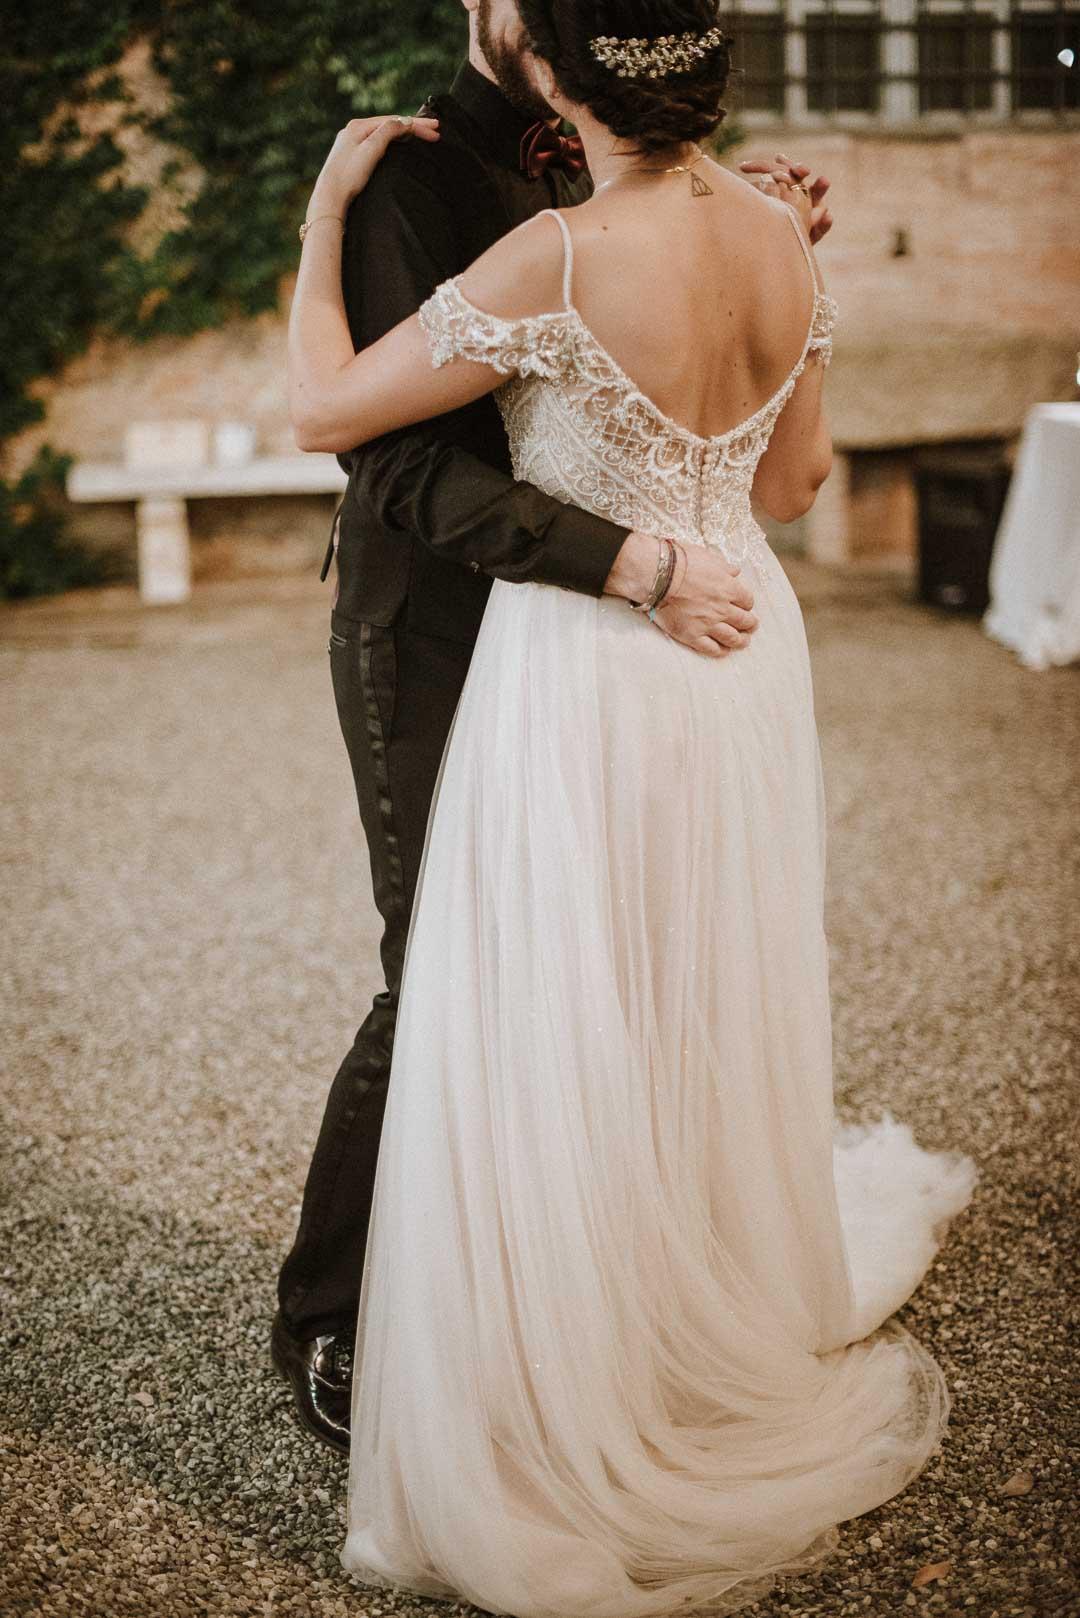 wedding-photographer-destination-fineart-bespoke-reportage-tuscany-villascorzi-vivianeizzo-spazio46-181